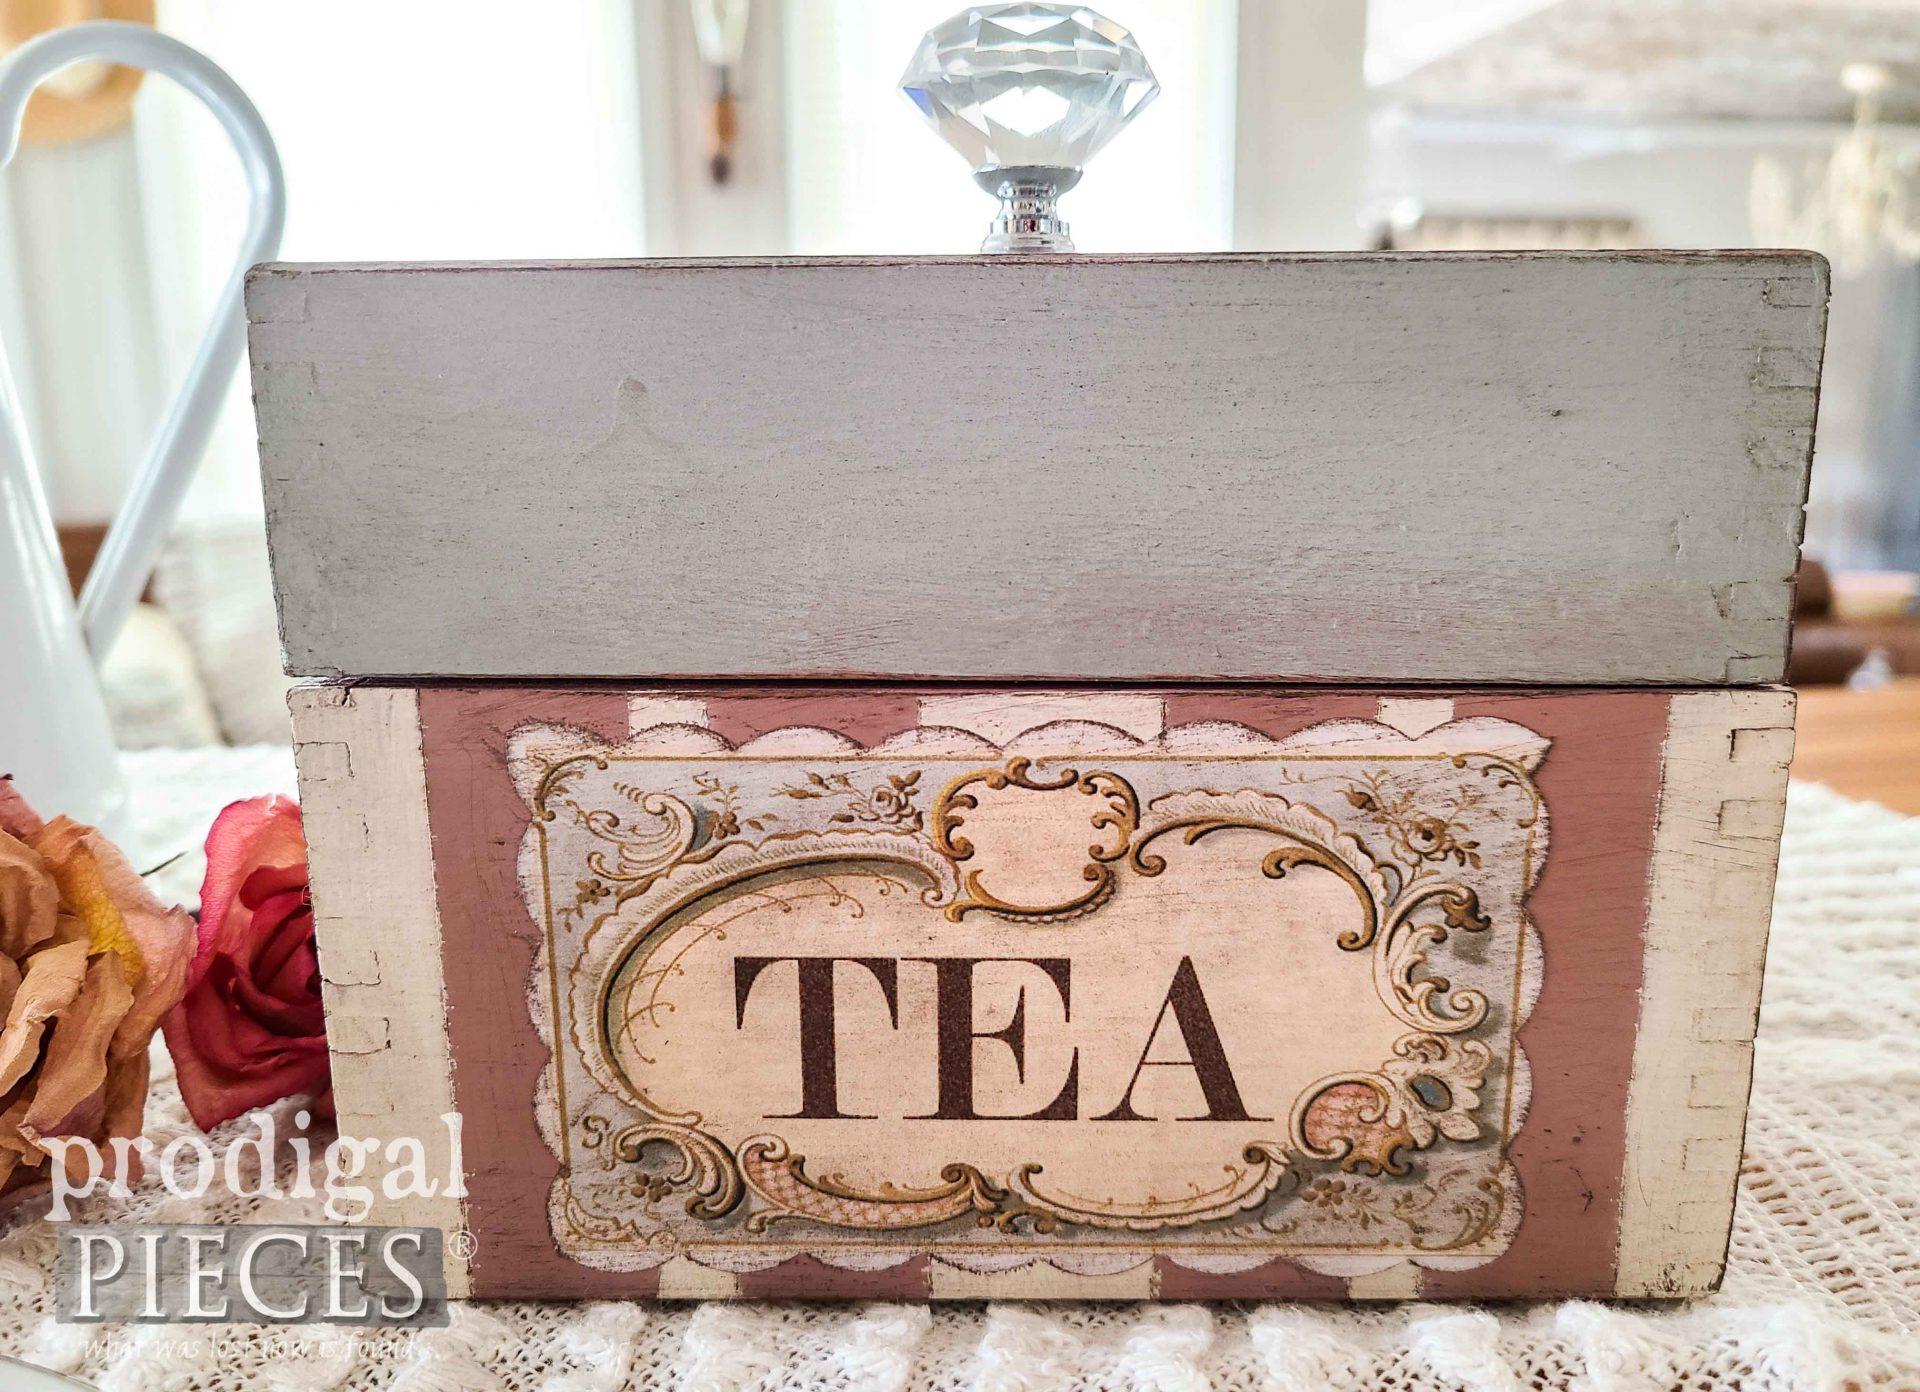 Shabby Chic Vintage Tea Box by Larissa of Prodigal Pieces | prodigalpieces.com #prodigalpieces #shabbychic #tea